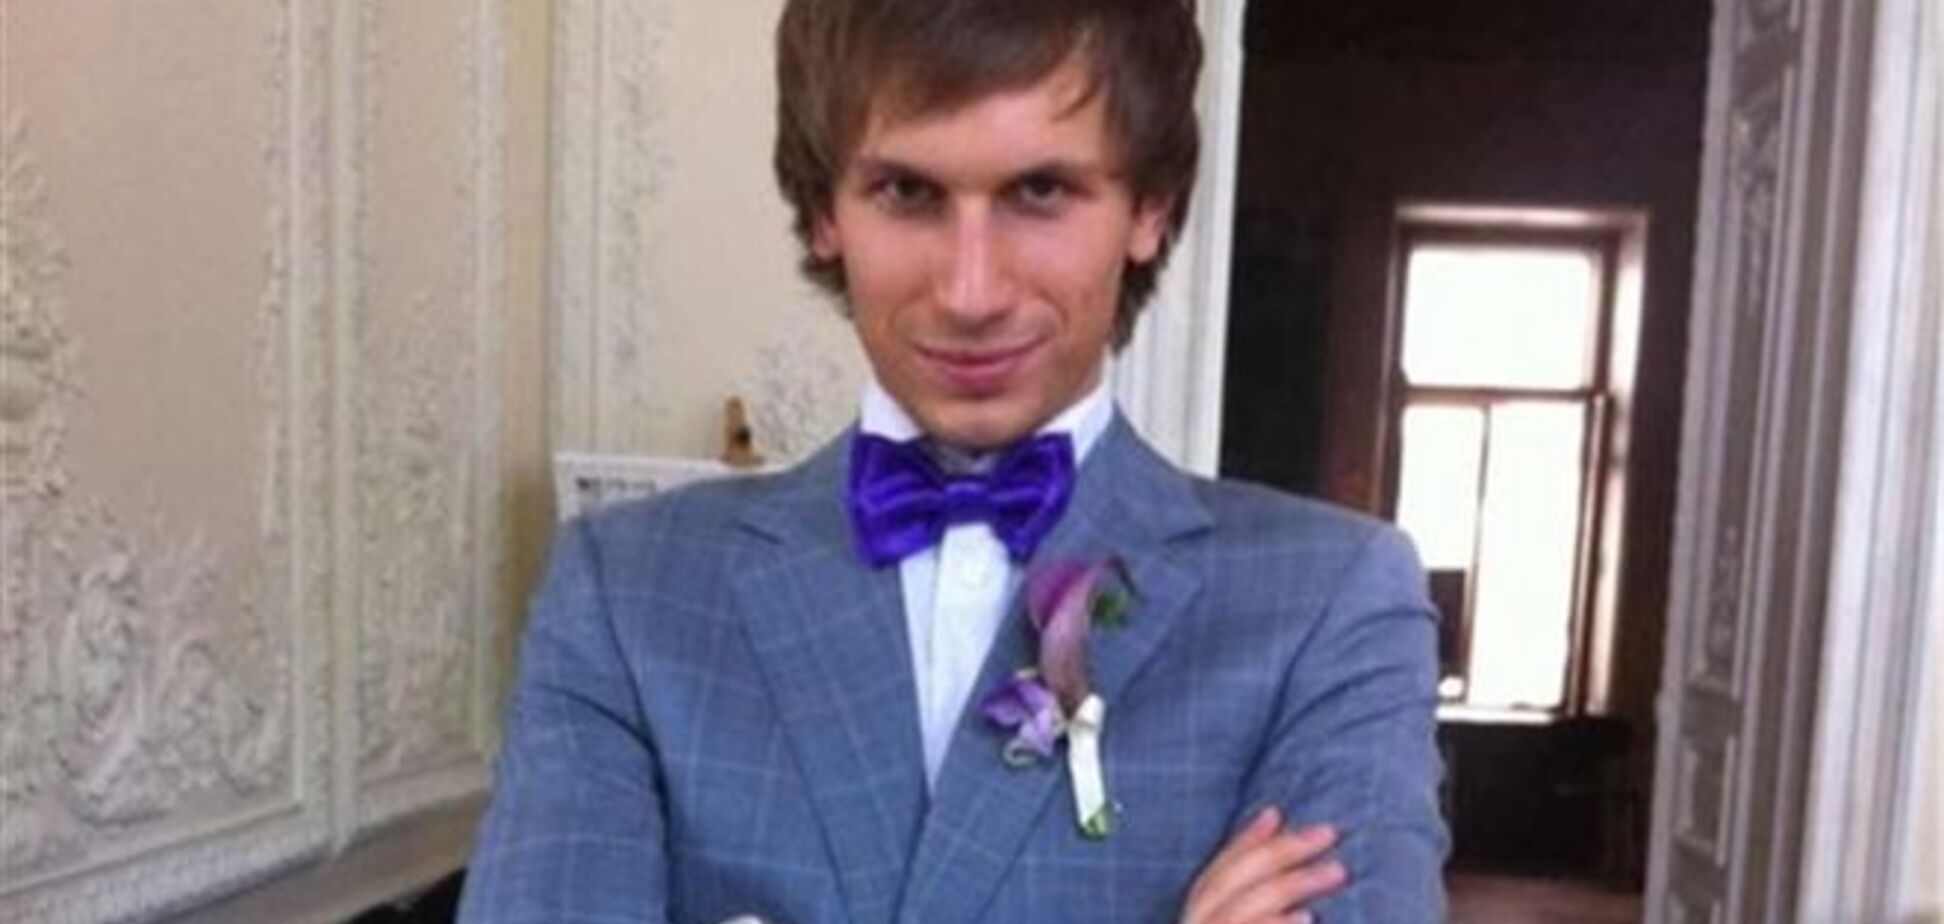 Сын нардепа Журавского отгулял свадьбу